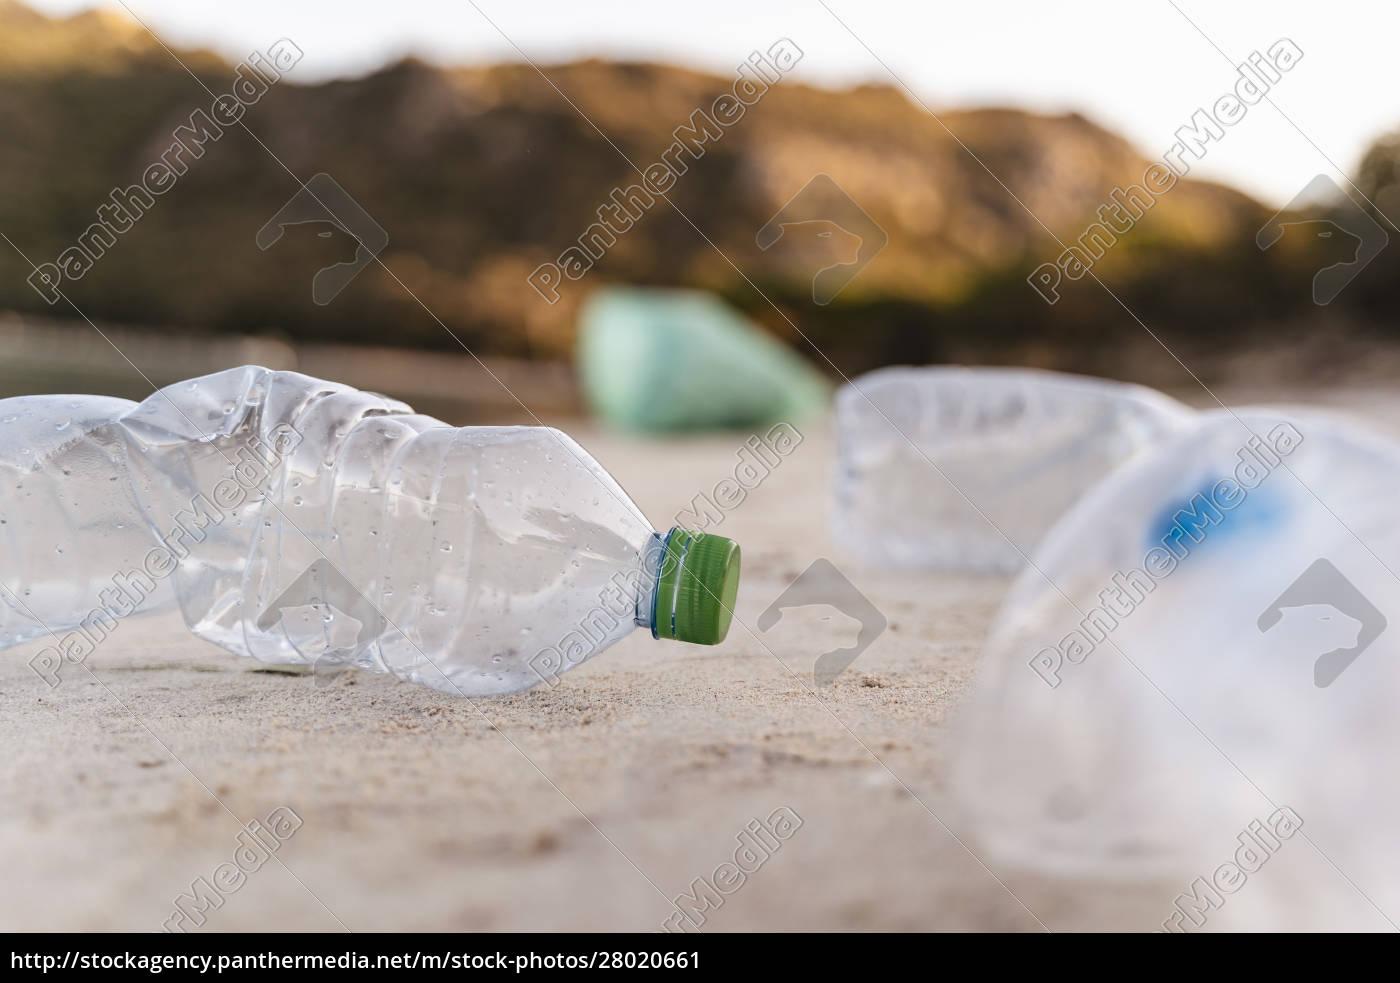 empty, plastic, bottles, on, the, beach - 28020661